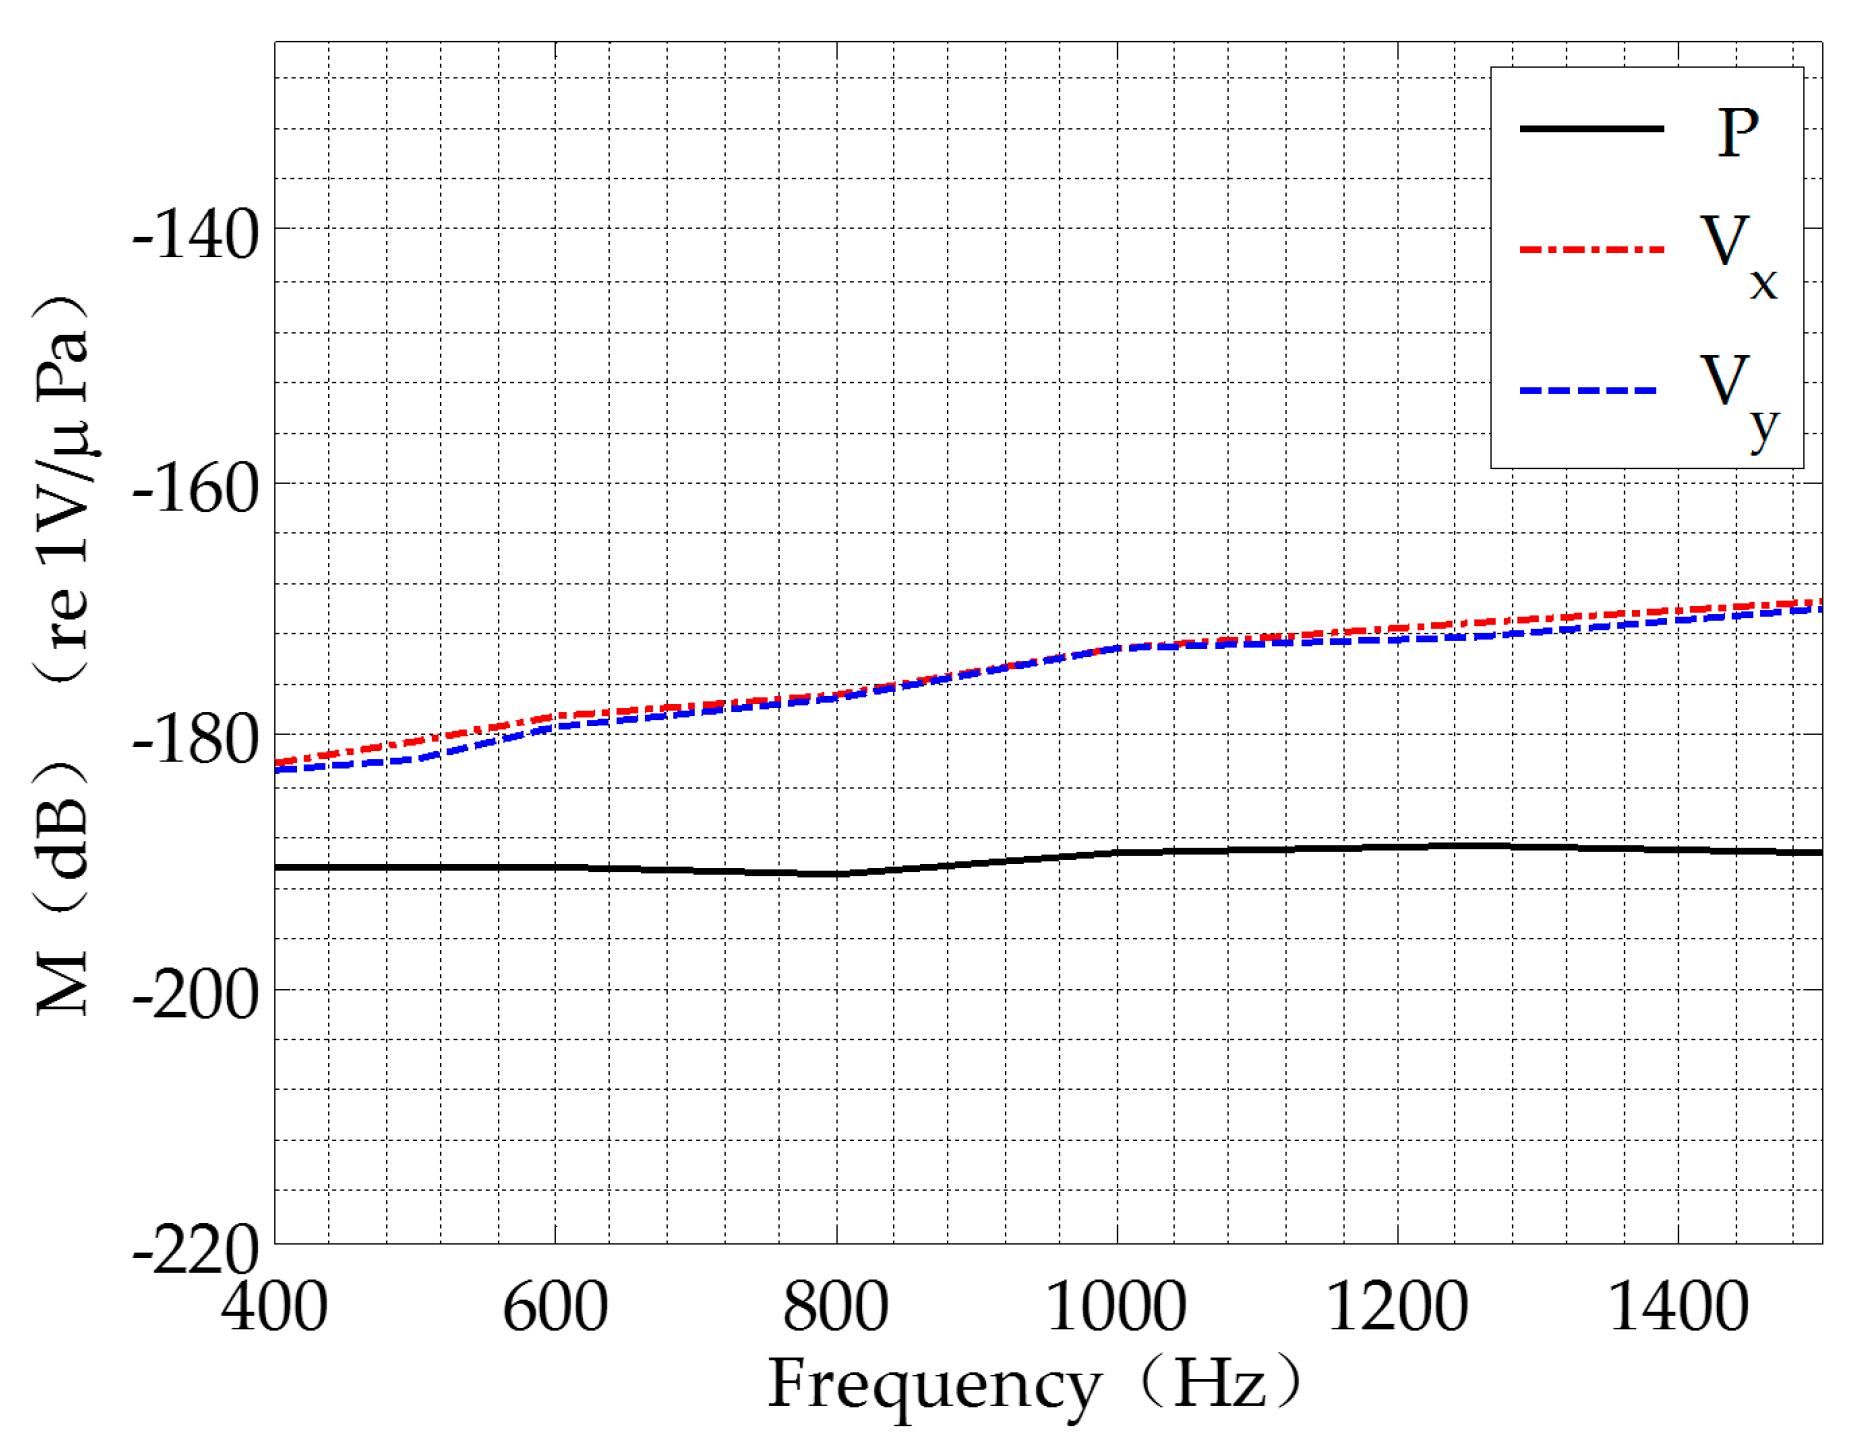 ads b diagram related keywords ads b diagram long tail keywords vector 9000 gps wiring diagram diagrams for car